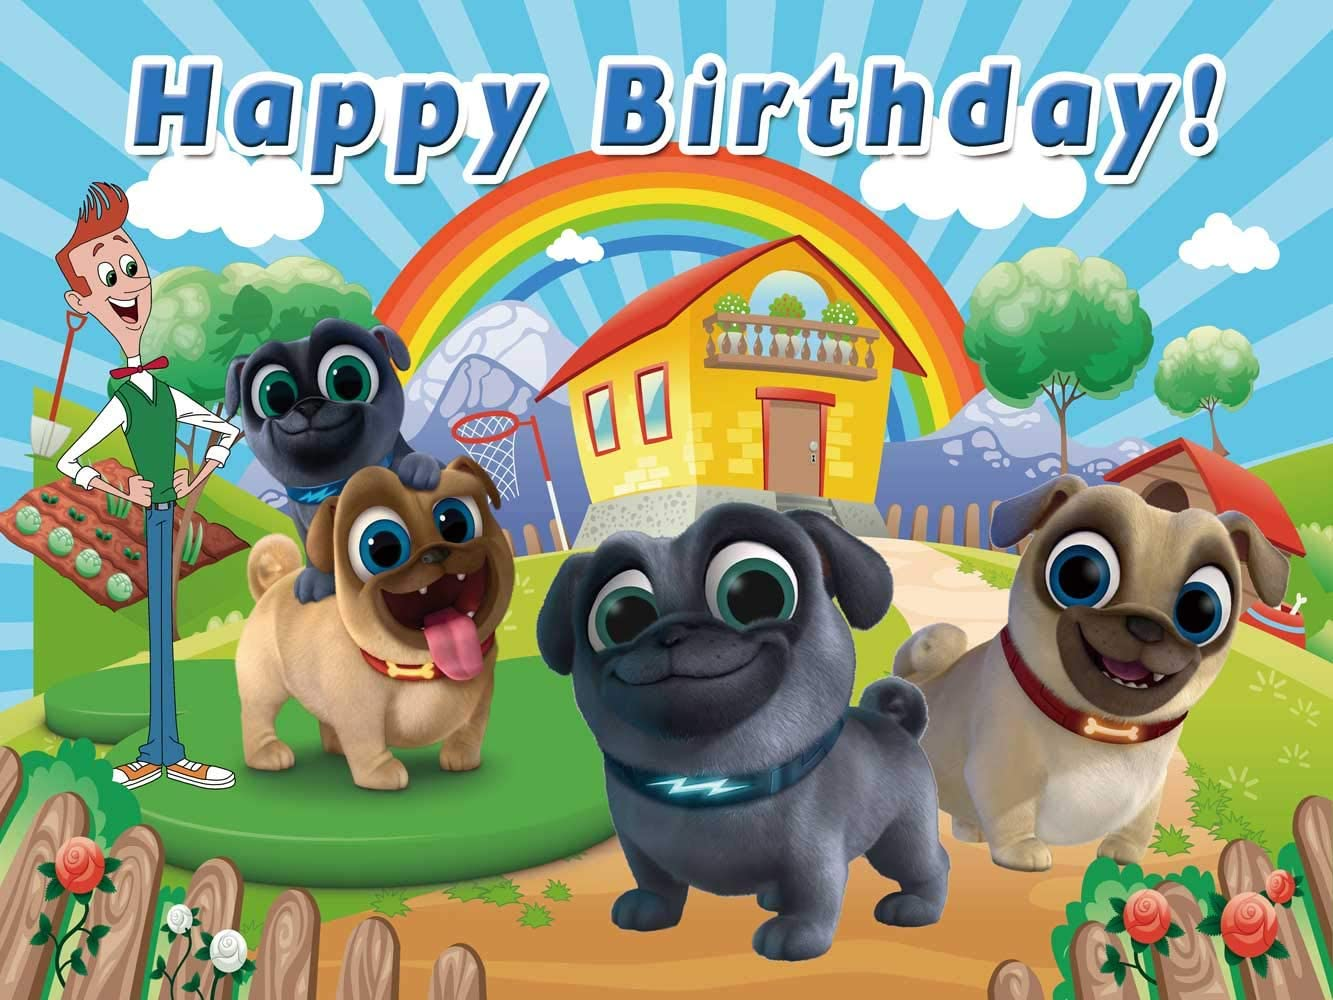 Personalized Name KidsChildren Birthday Party Decoration Banner Dog Background Happy Birthday Banner Dog Lovers Birthday Party Banners